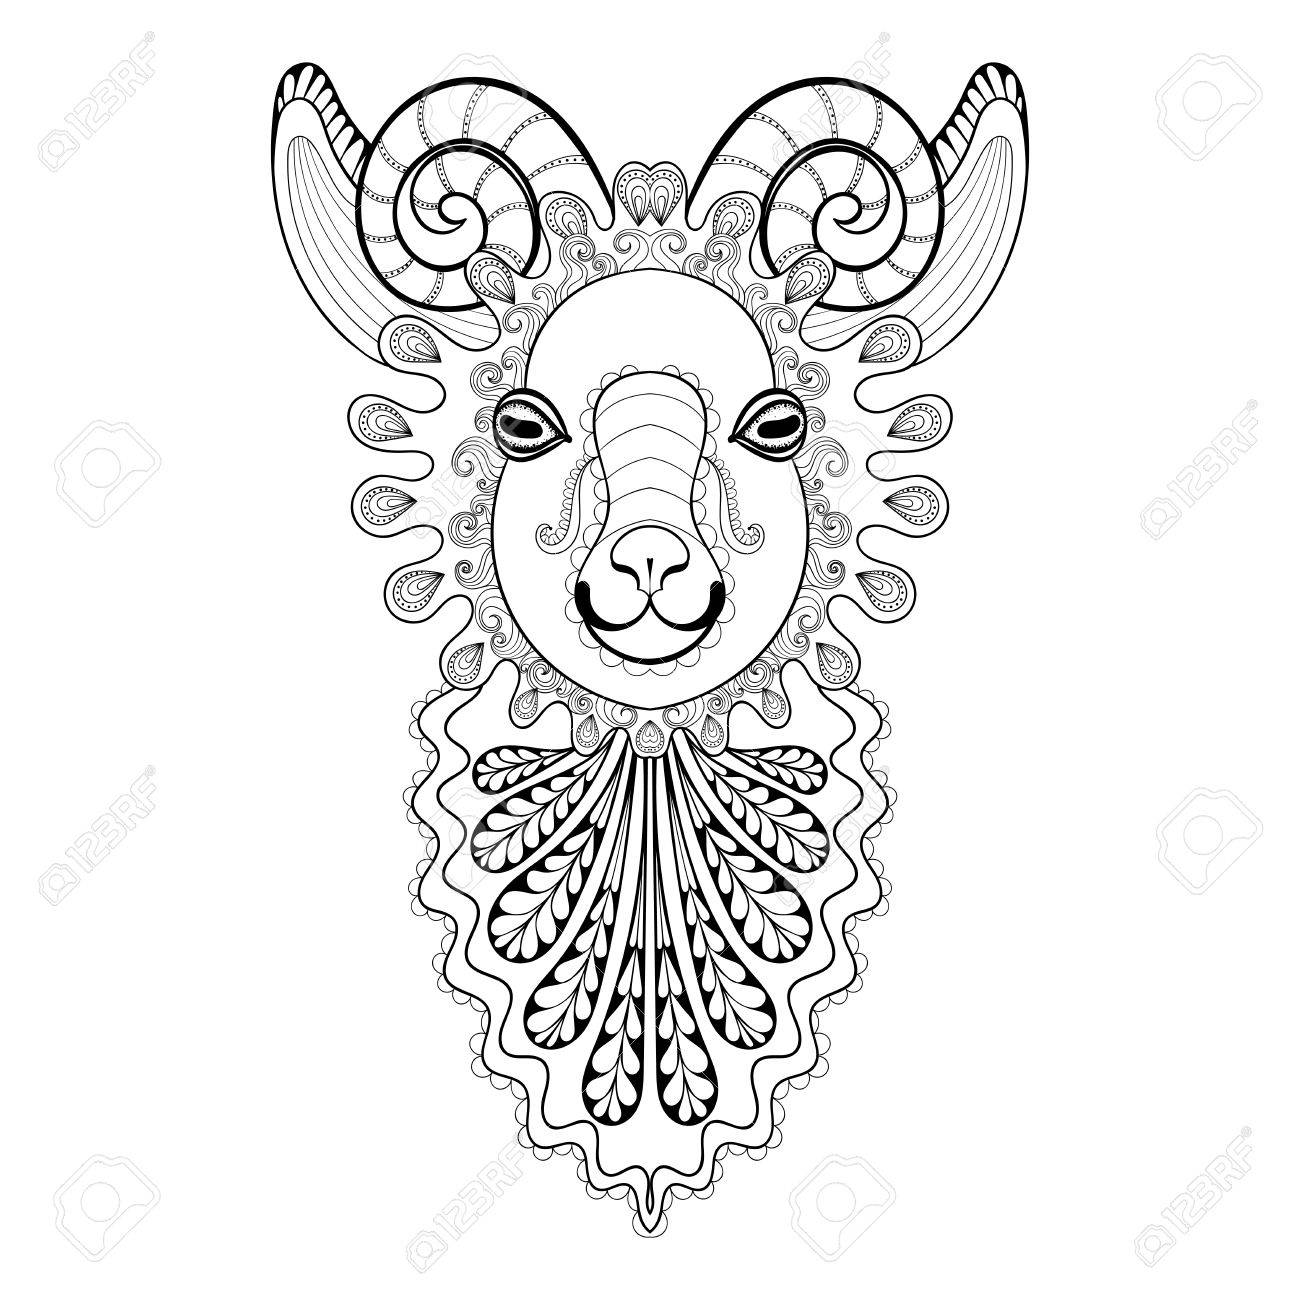 1300x1300 Vector Zentangle Ram Head Illustration, Goat Print For Adult